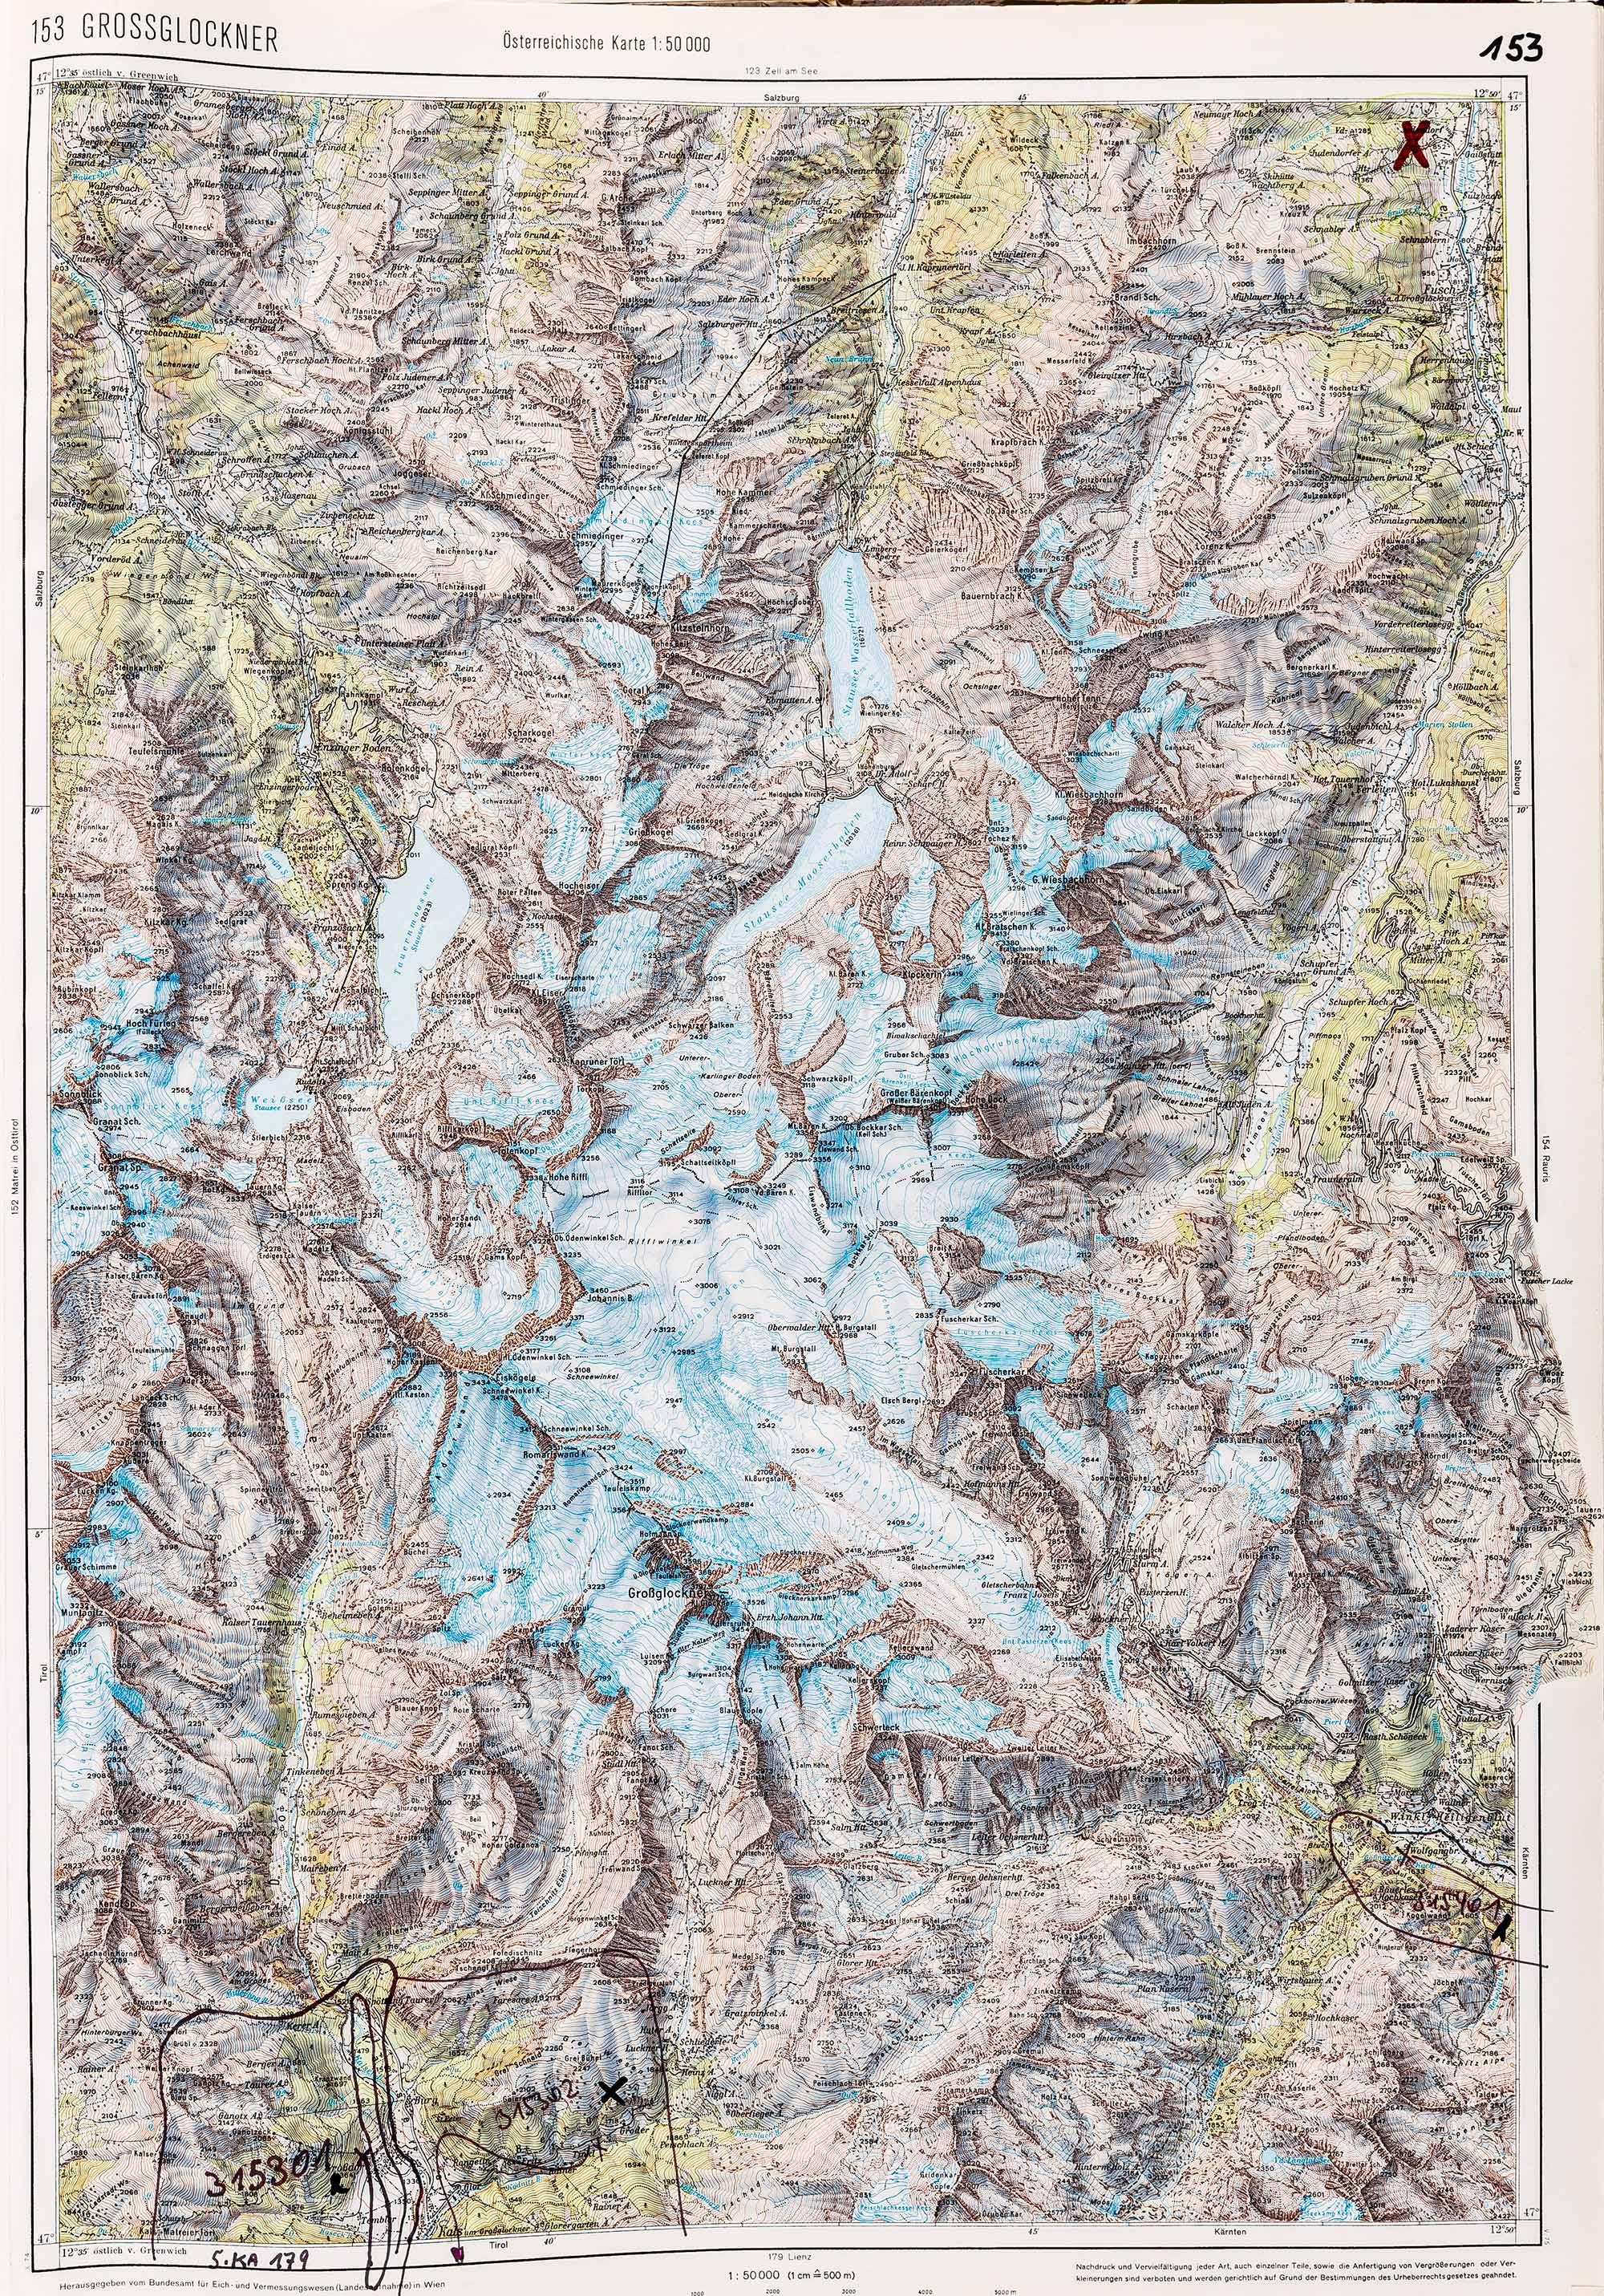 1983-1986 Karte 153